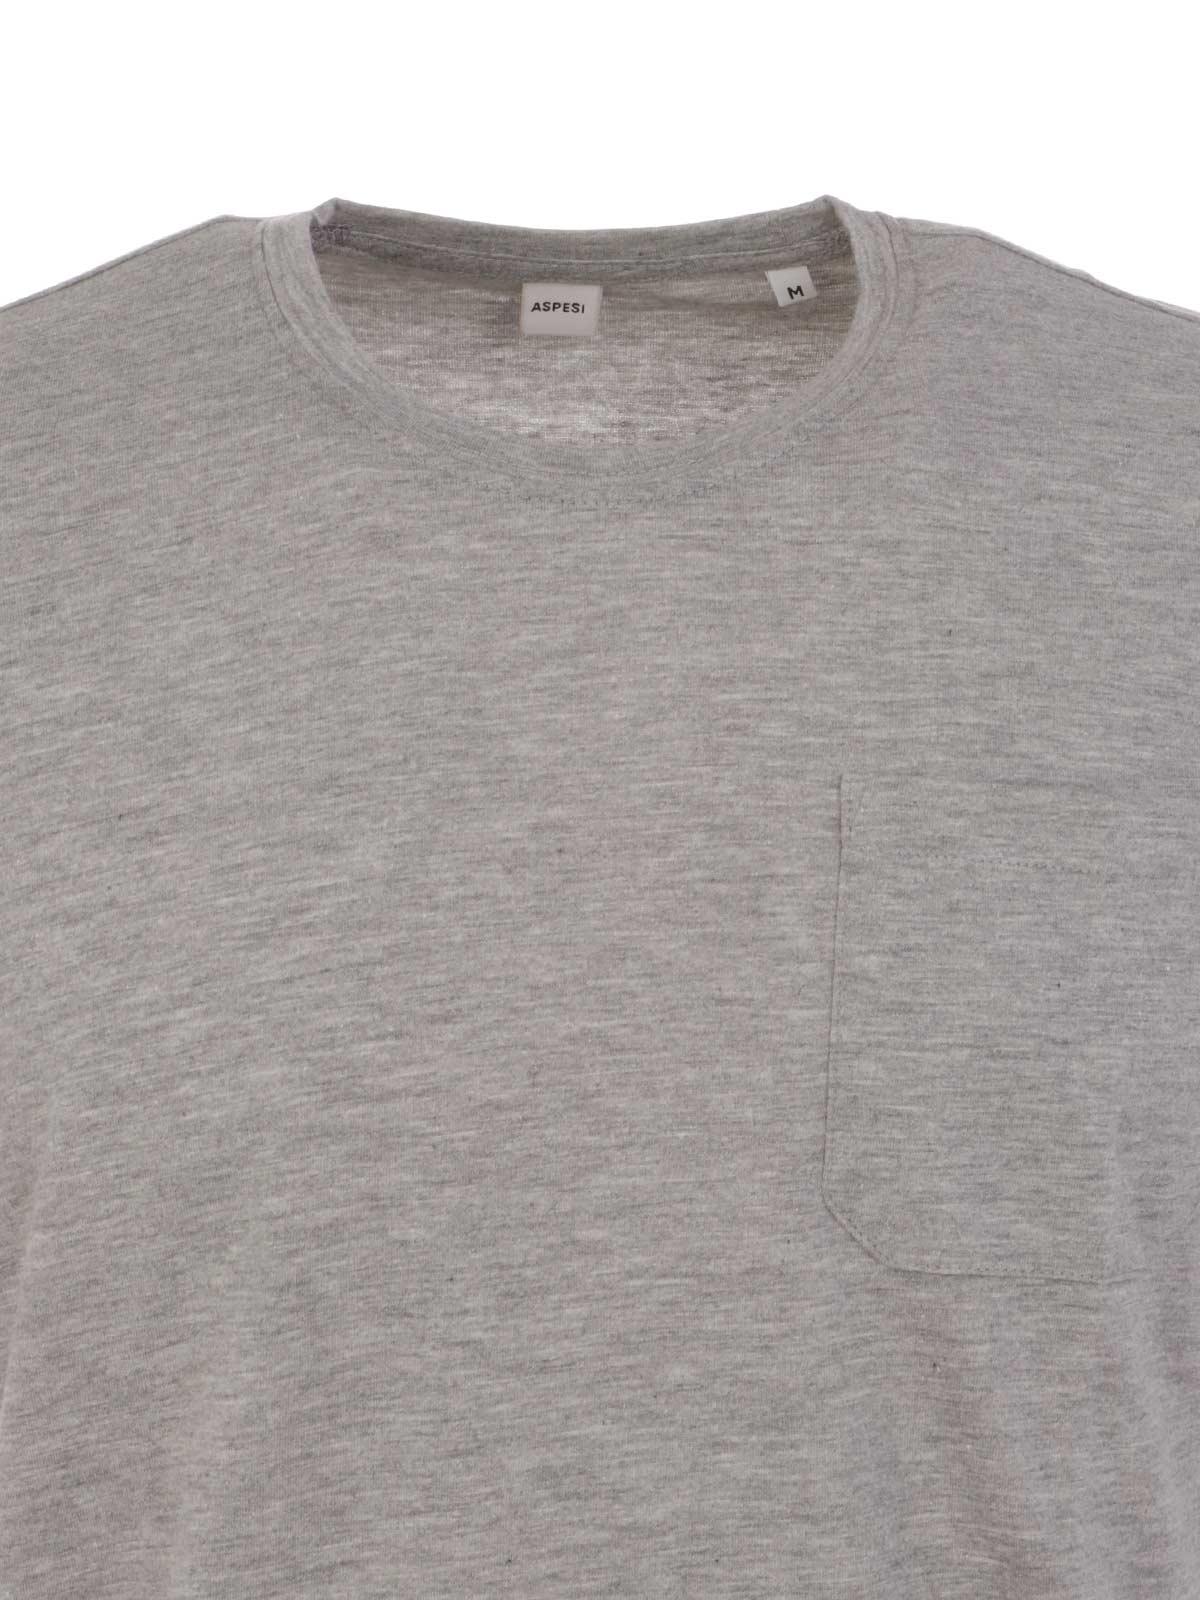 Picture of ASPESI | Men's Slim Fit T-shirt